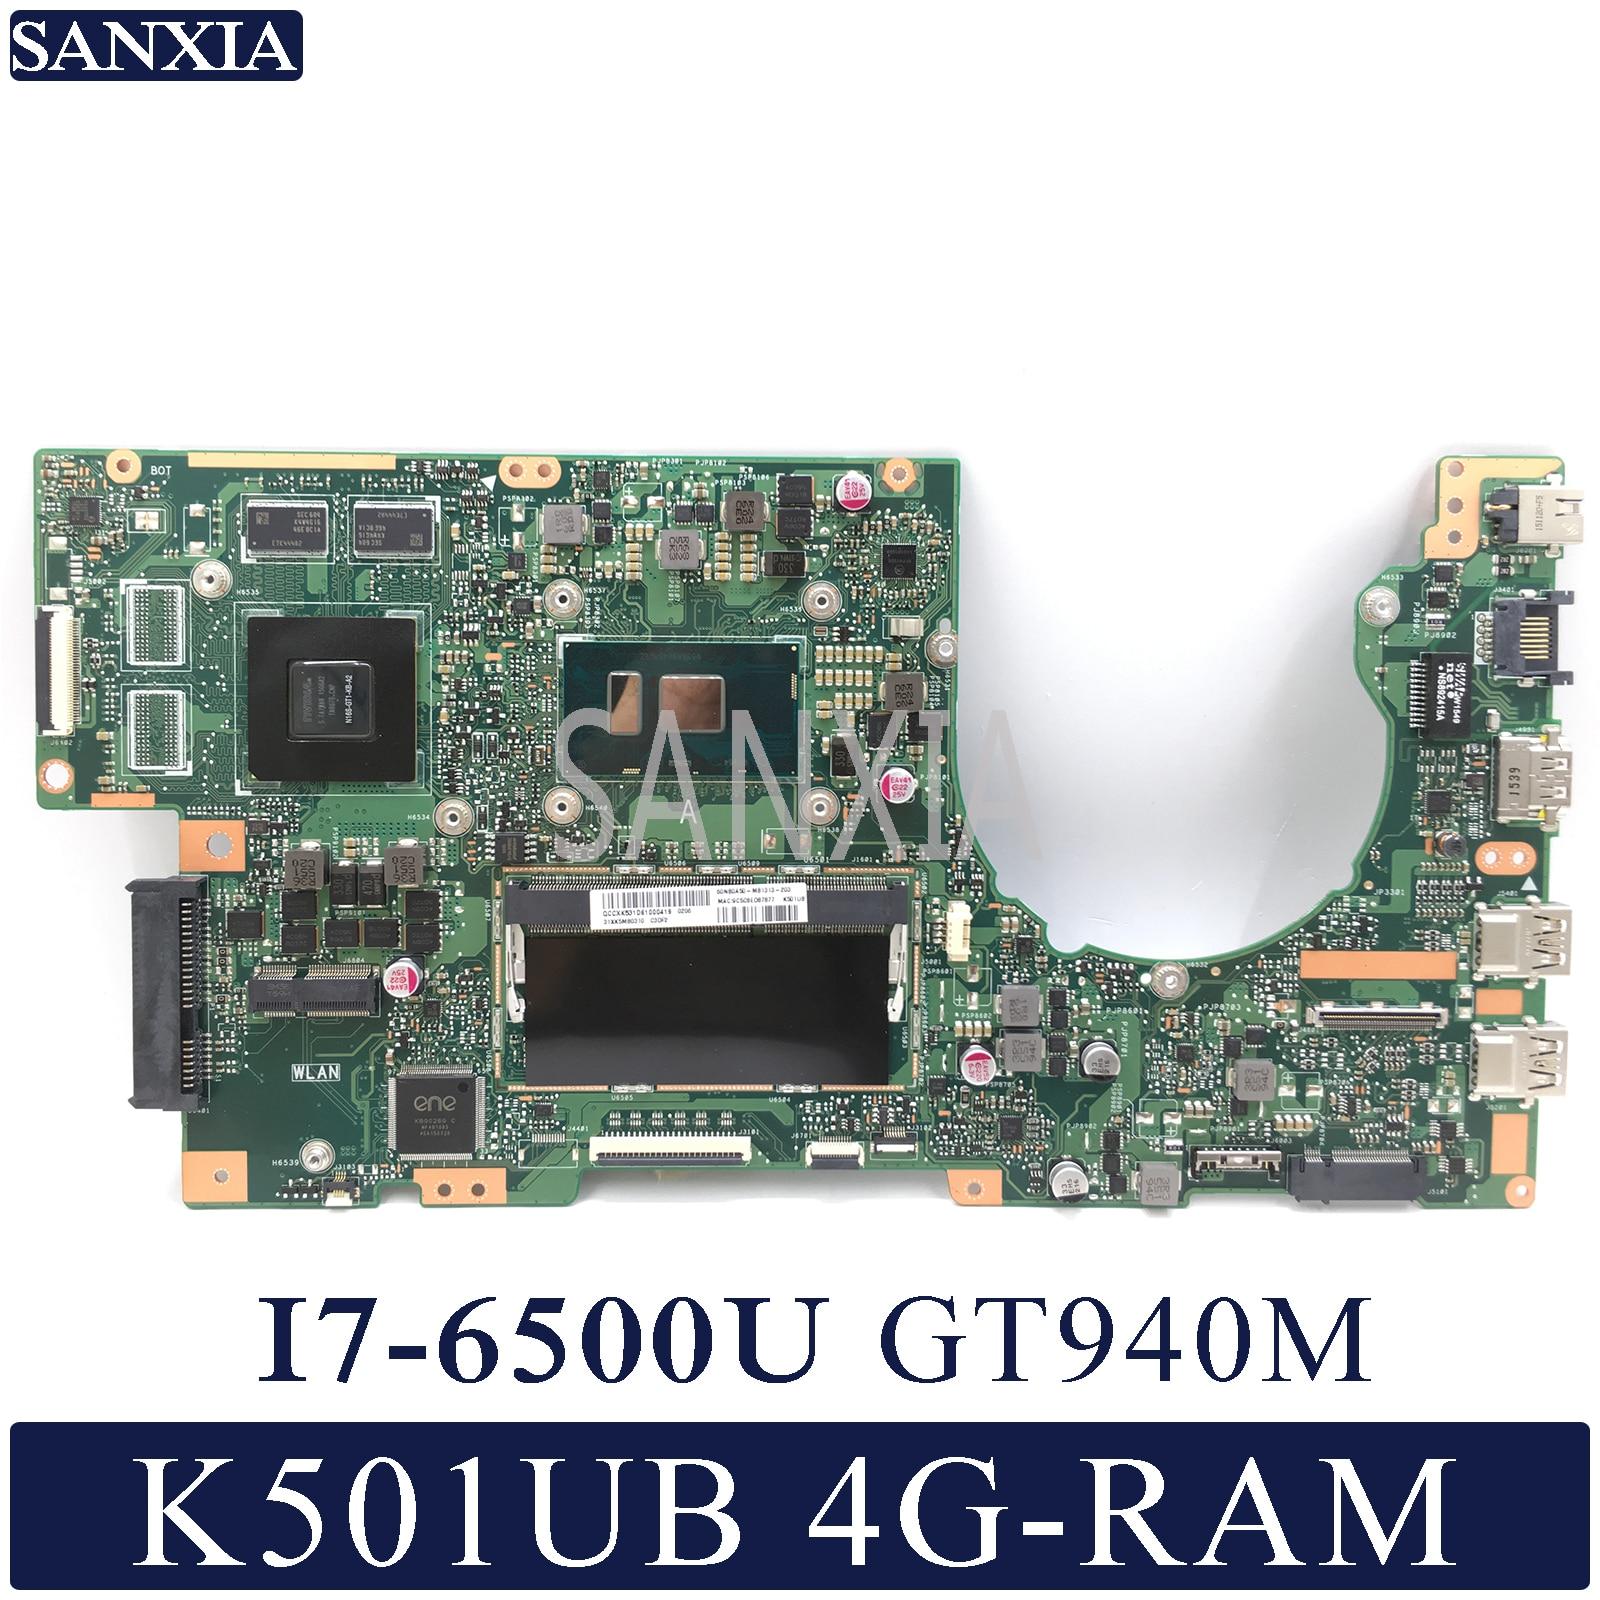 KEFU K501UX Laptop motherboard para ASUS K501UB K501U Teste mainboard original DDR3 4G-RAM I7-6500U GT940M